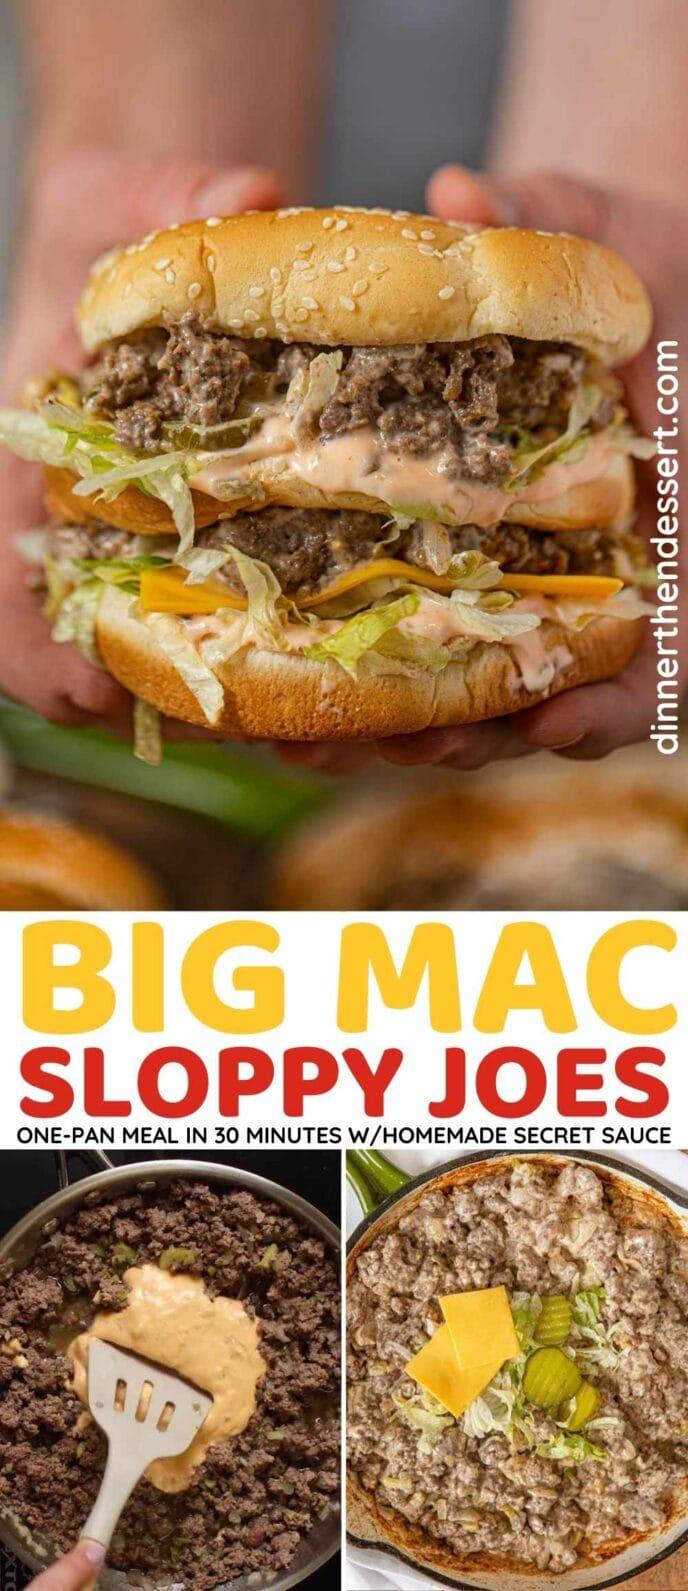 Big Mac Sloppy Joes Collage